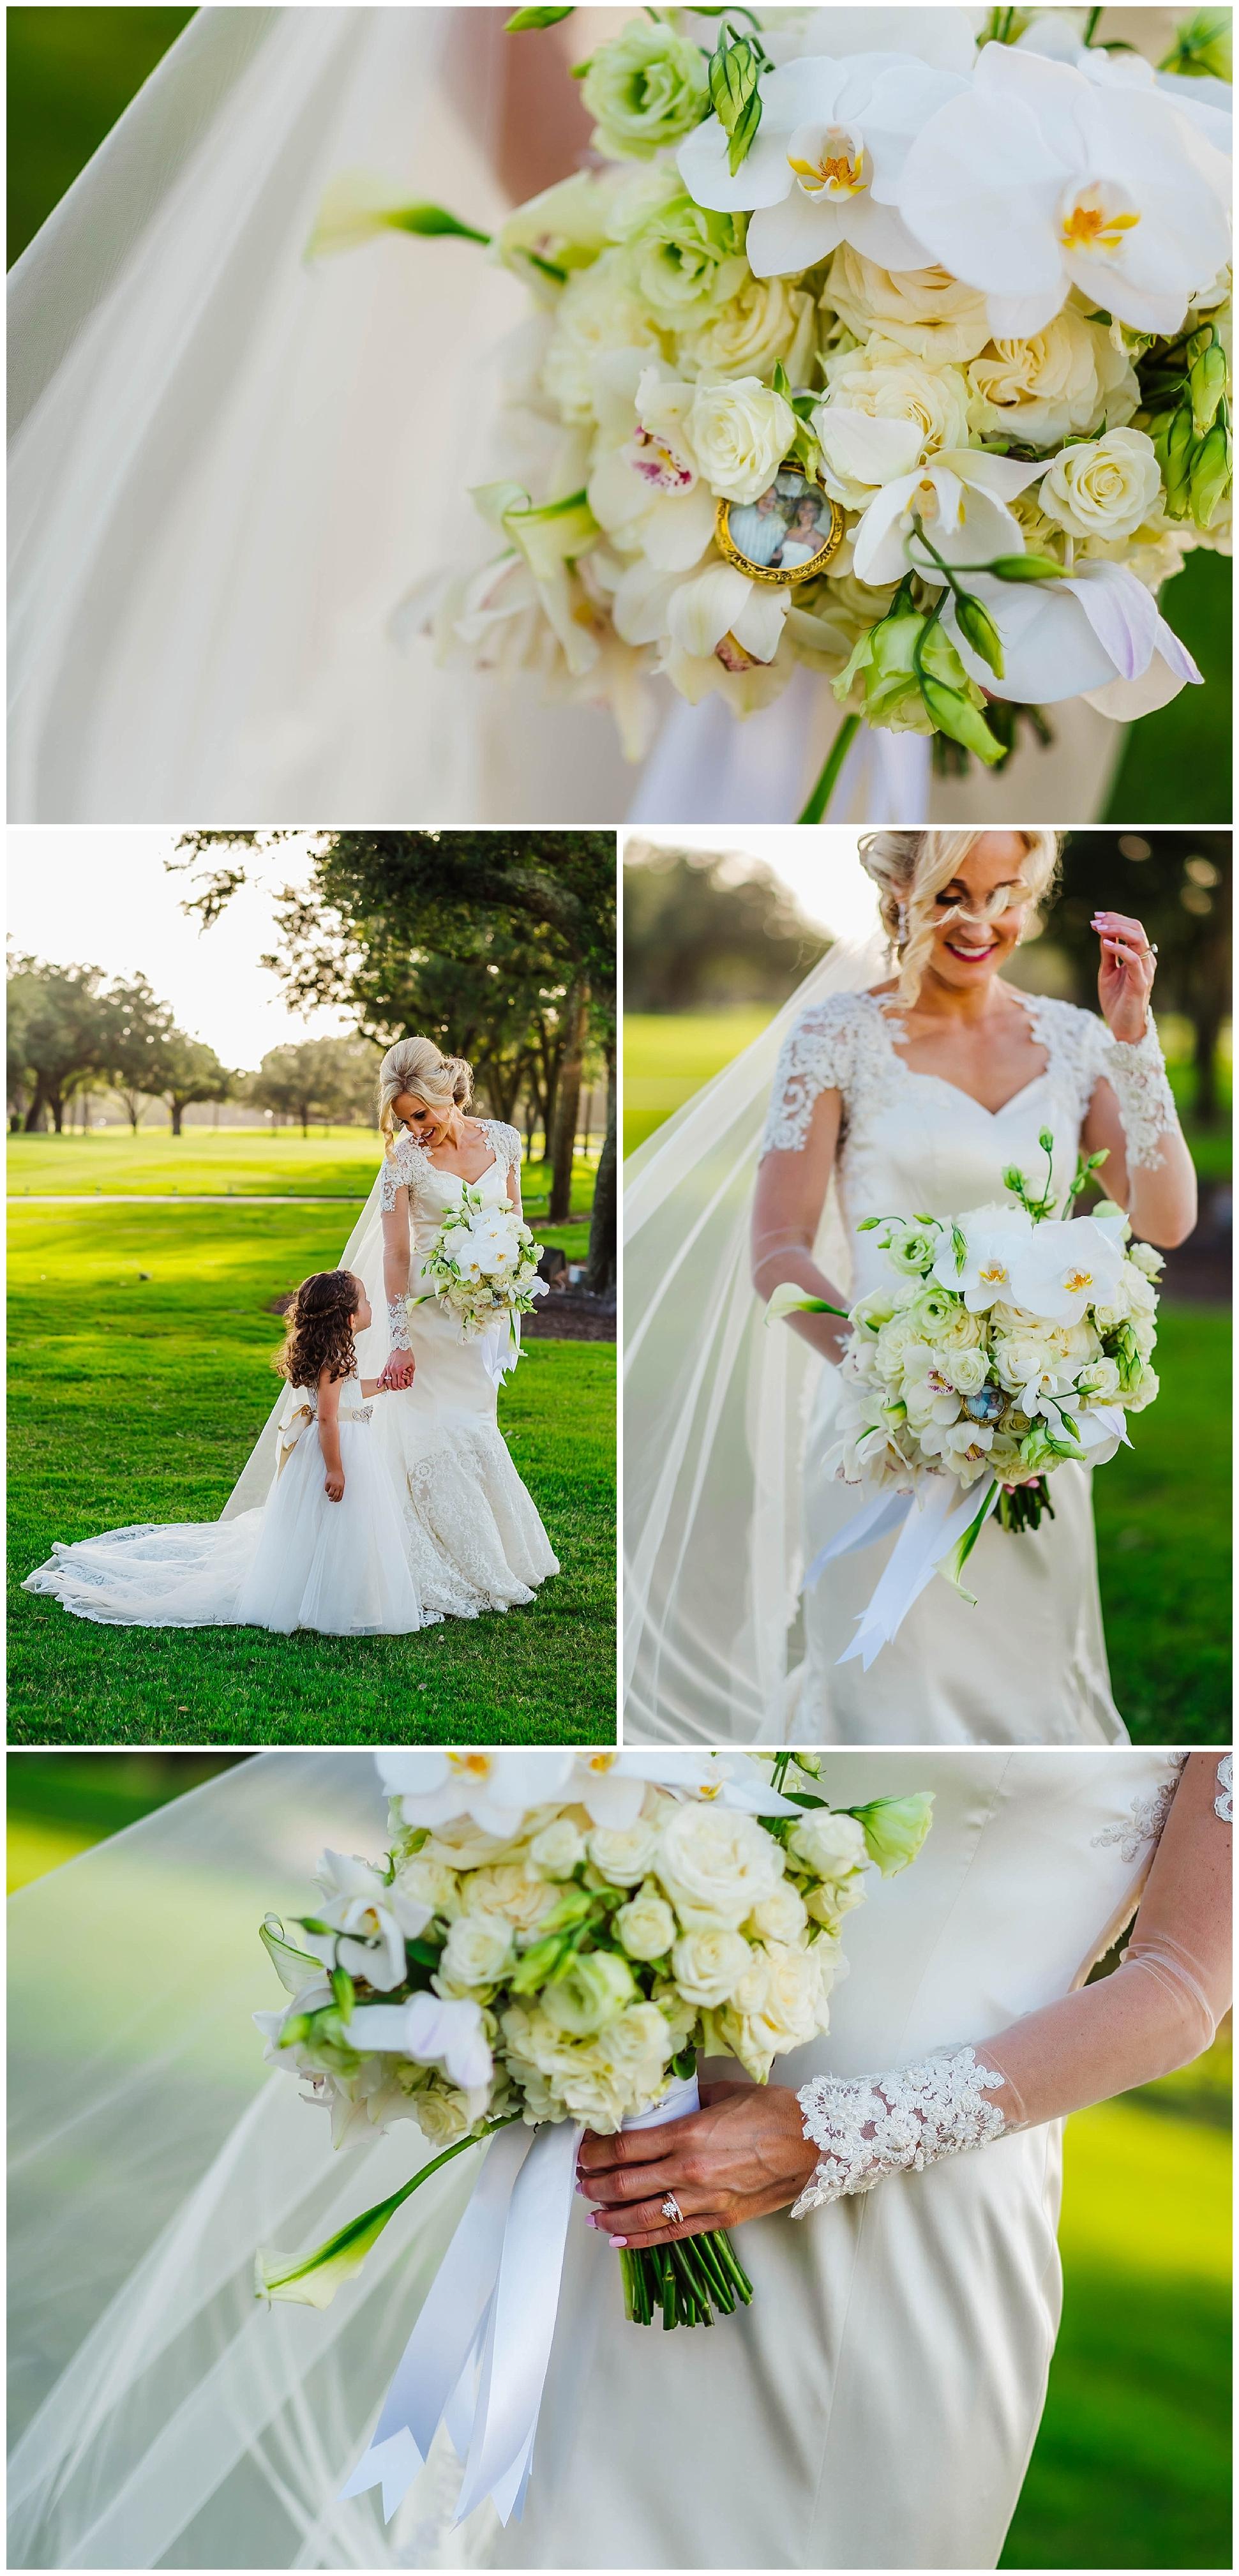 tampa-wedding-photographer-sleeves-palma-ceia-country-club-golf-course-sunset-luxury_0075.jpg